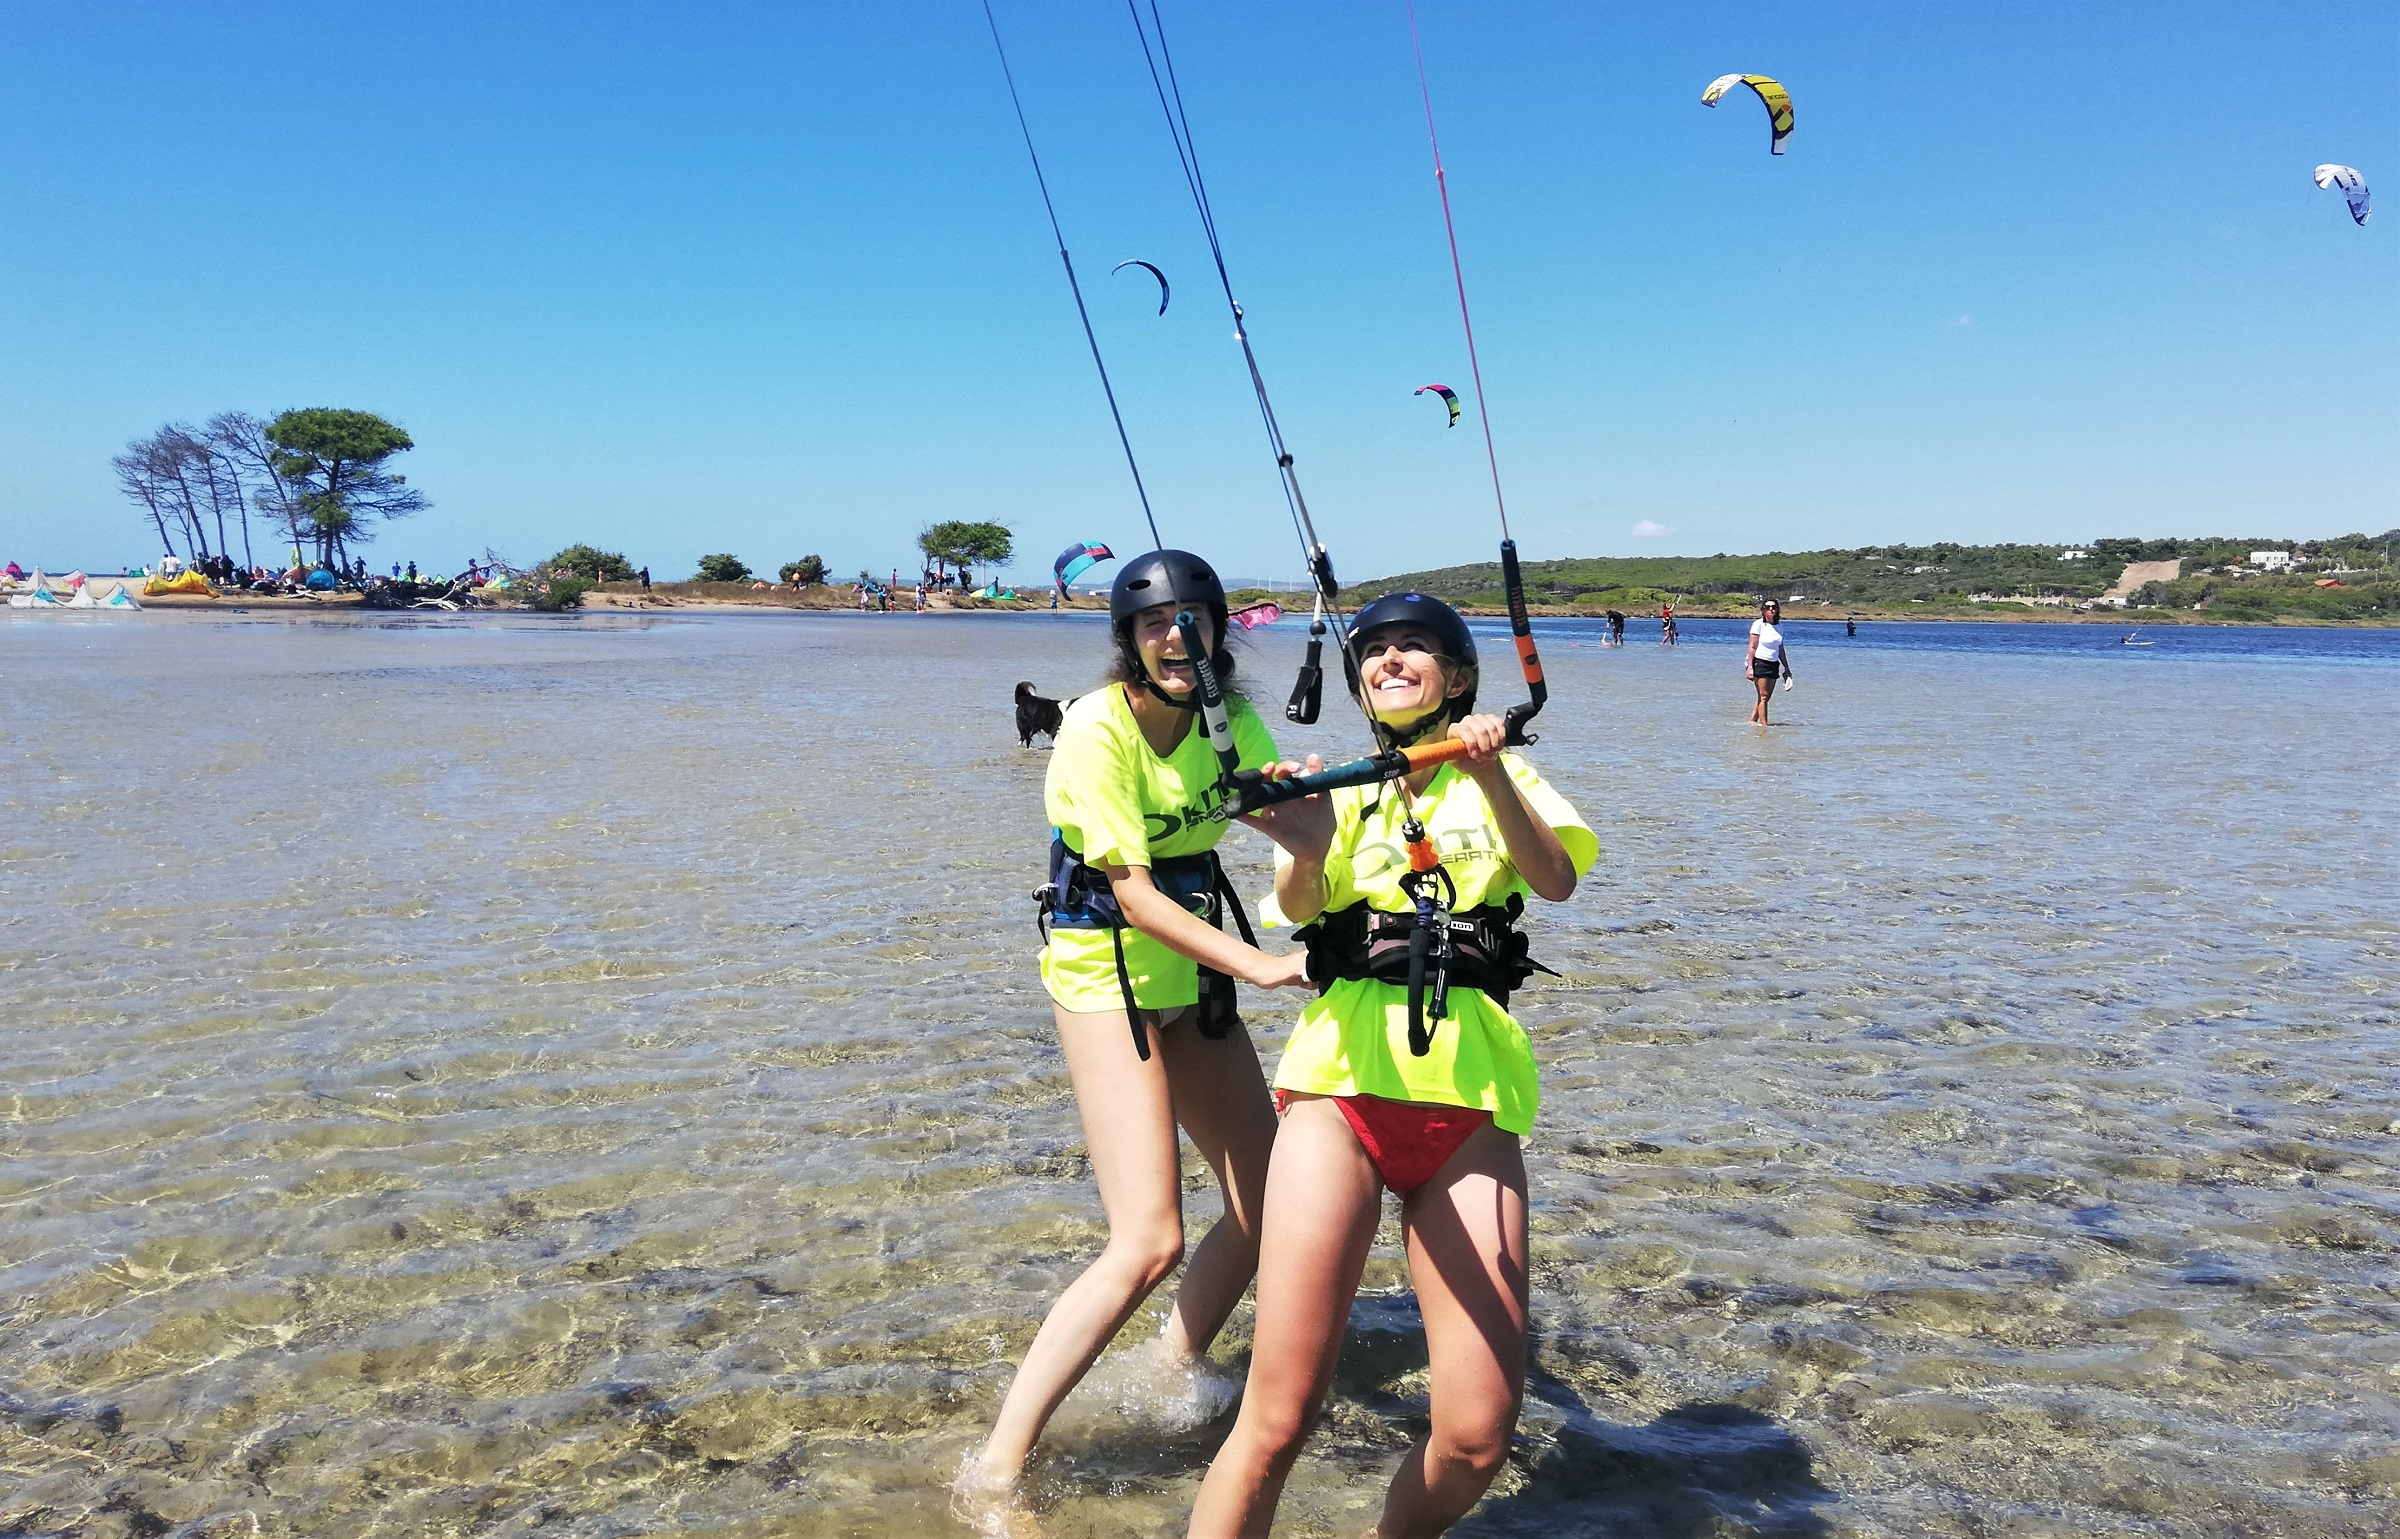 Enjoying Kite Lessons in Punta Trettu, the Best Kite Spot of Sardinia